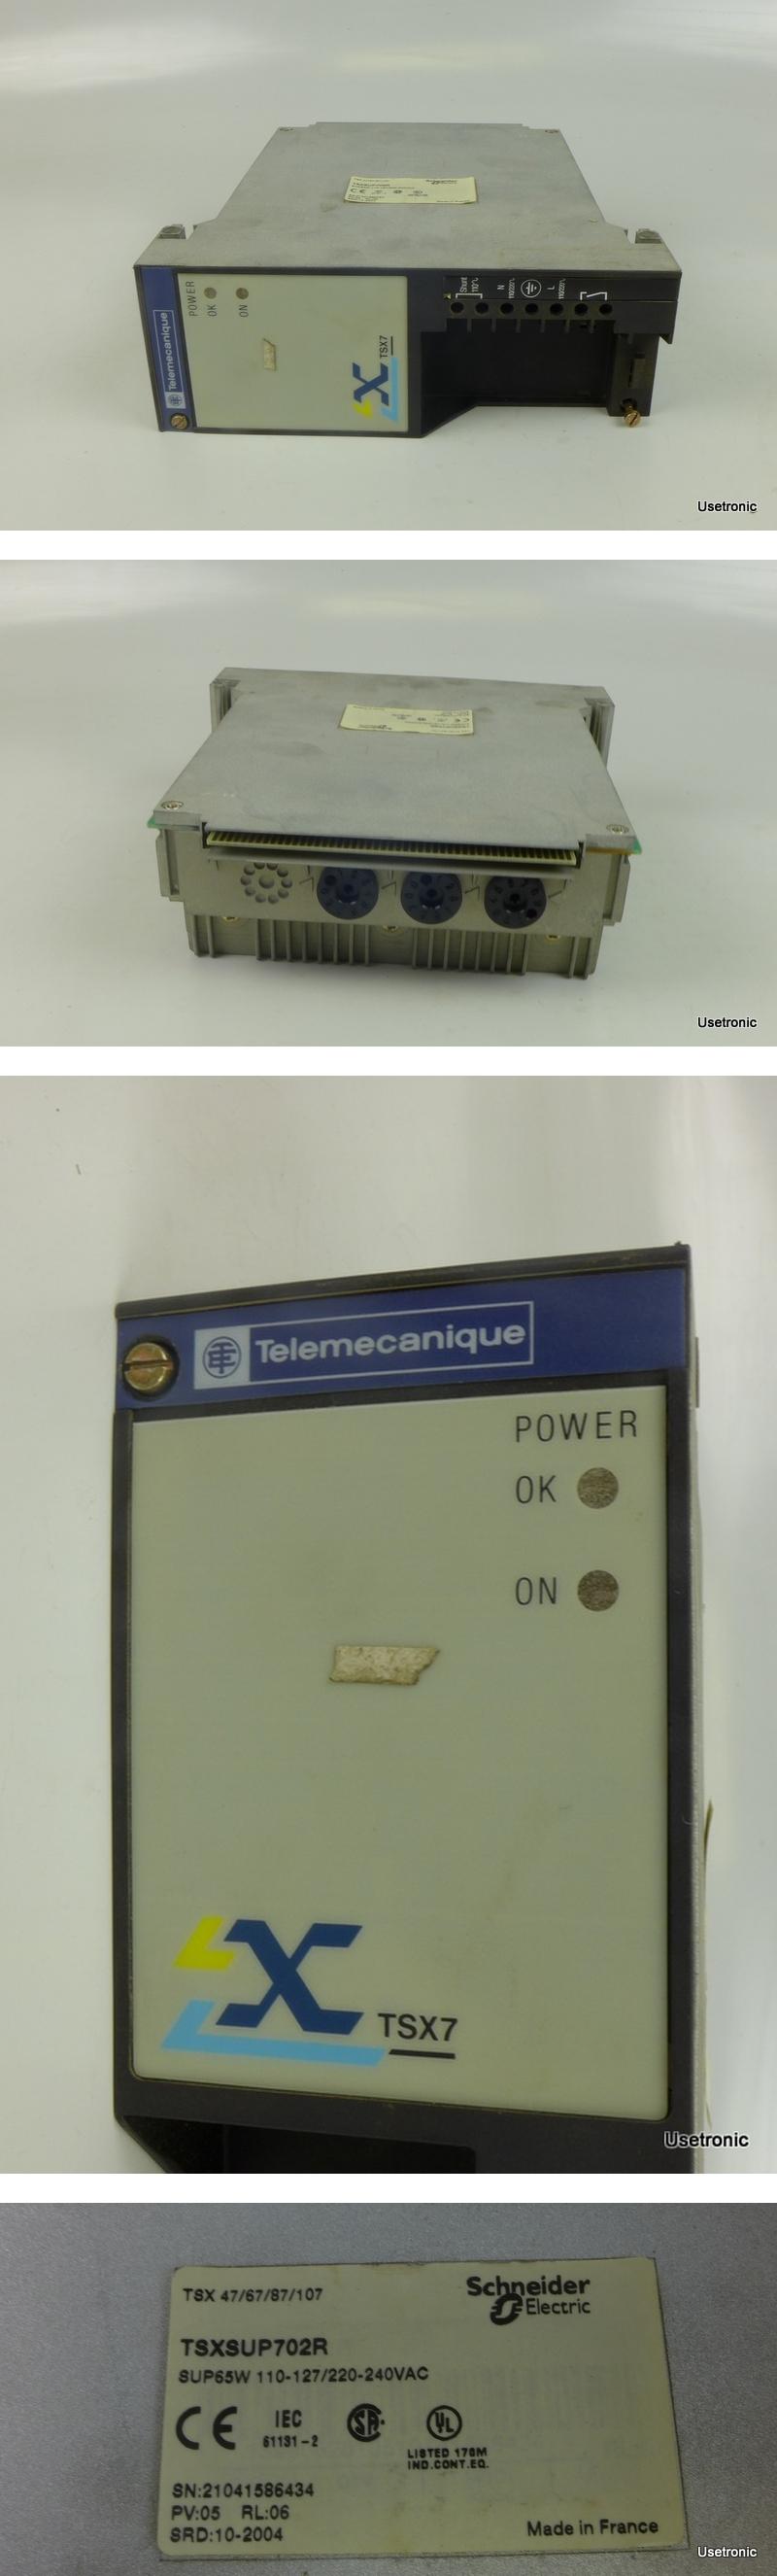 Telemecanique TSXSUP702